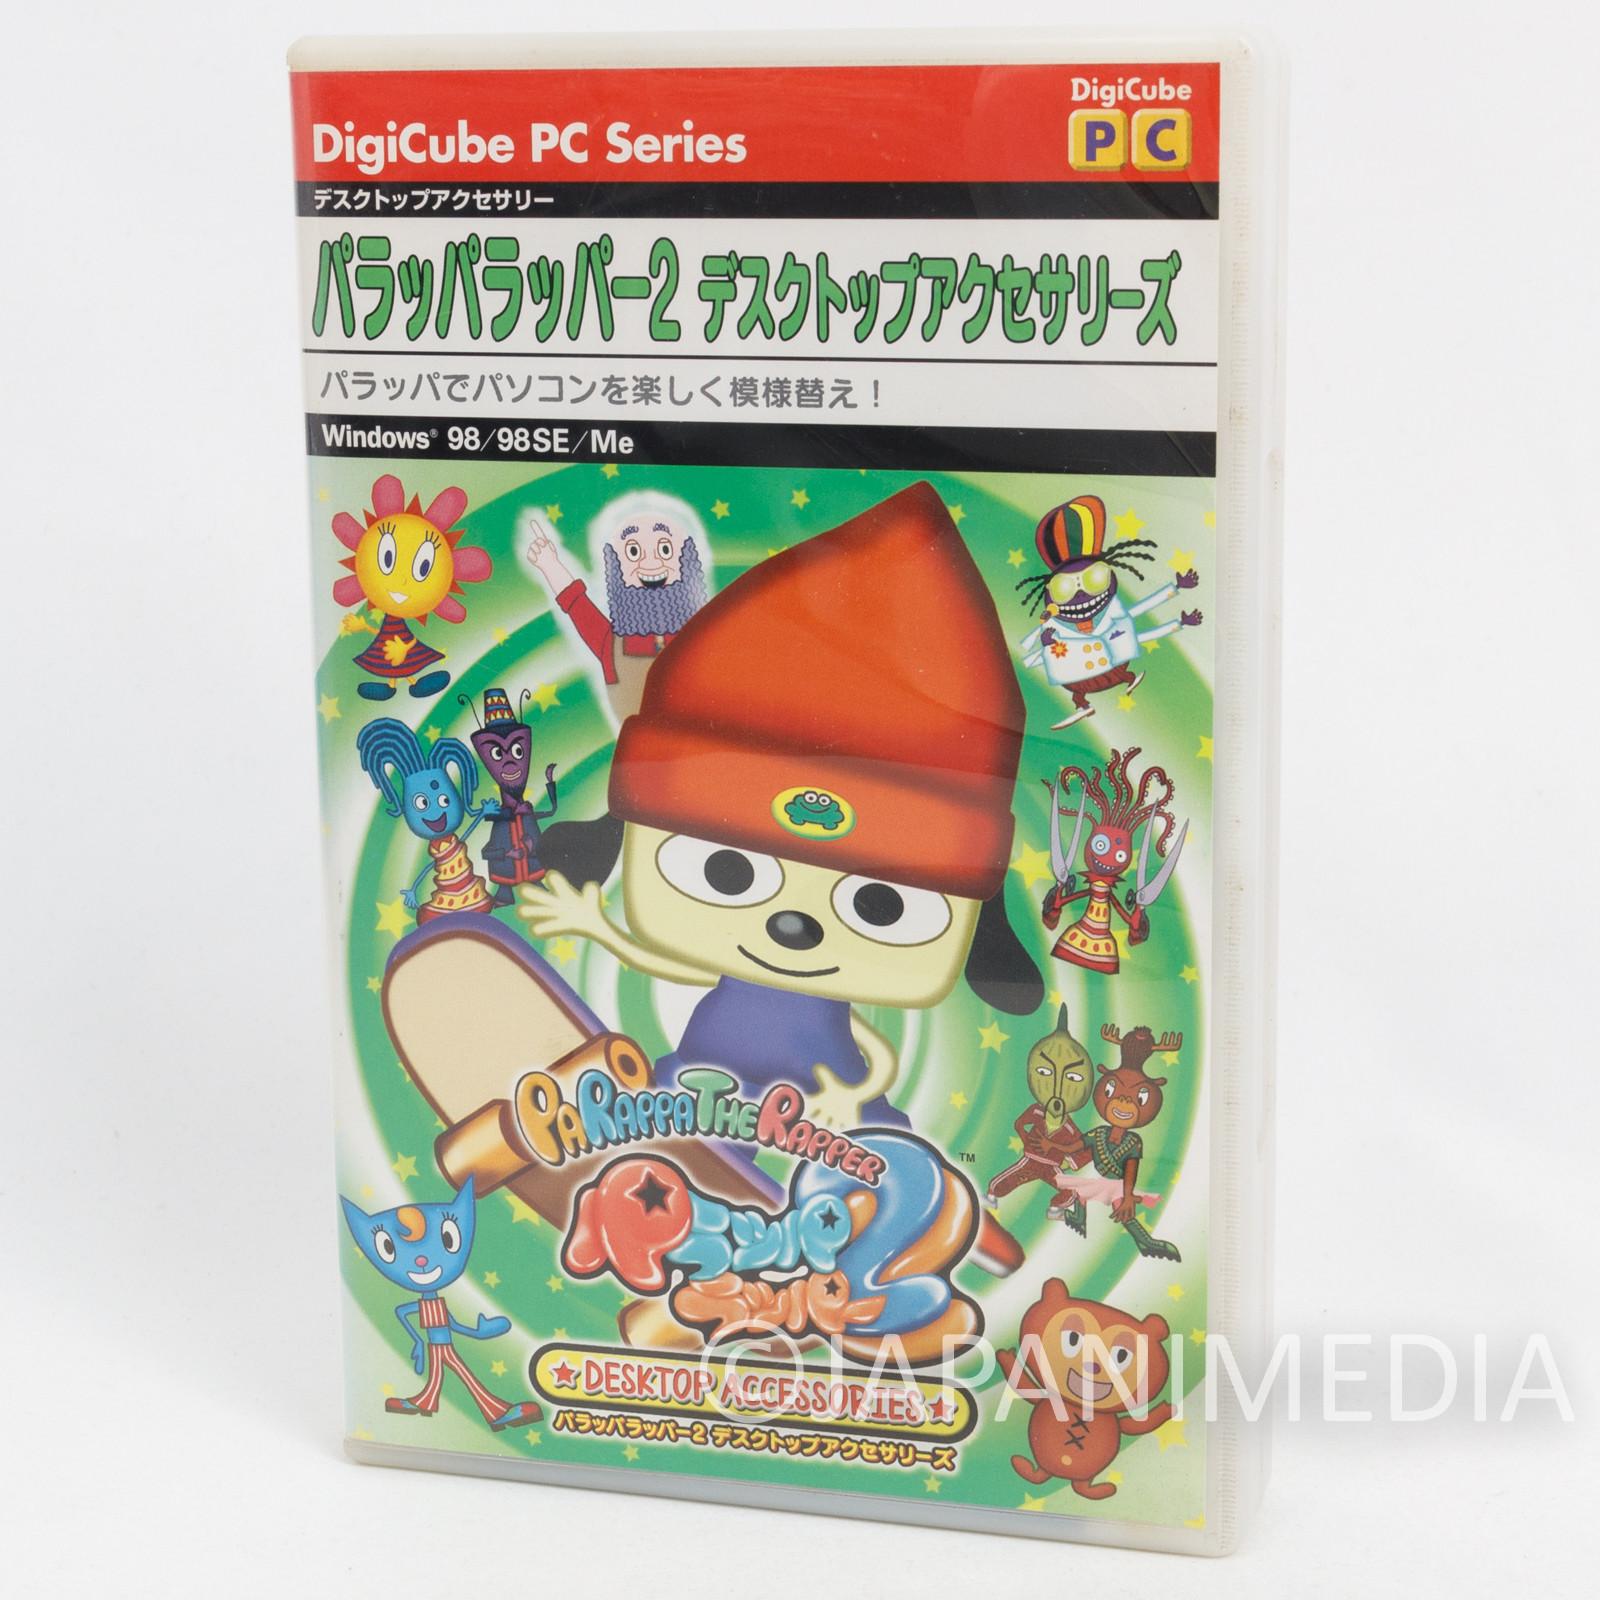 Parappa The Rapper CD-ROM Desktop Accesaries Digicube DTA Series Vol.4